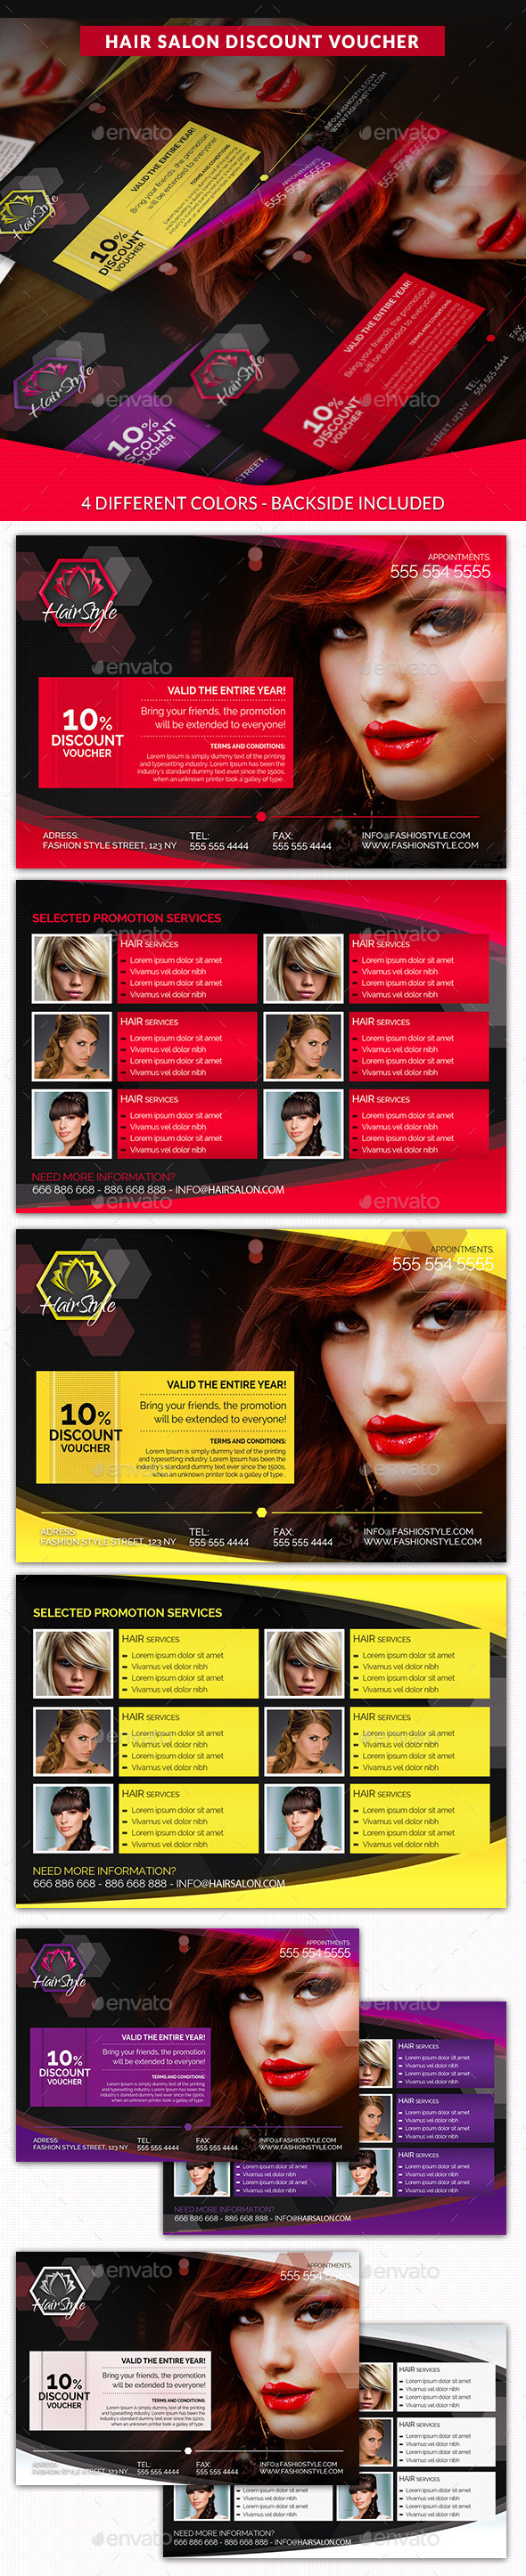 Hair Salon Fashion Style Discount Voucher - Cards & Invites Print Templates